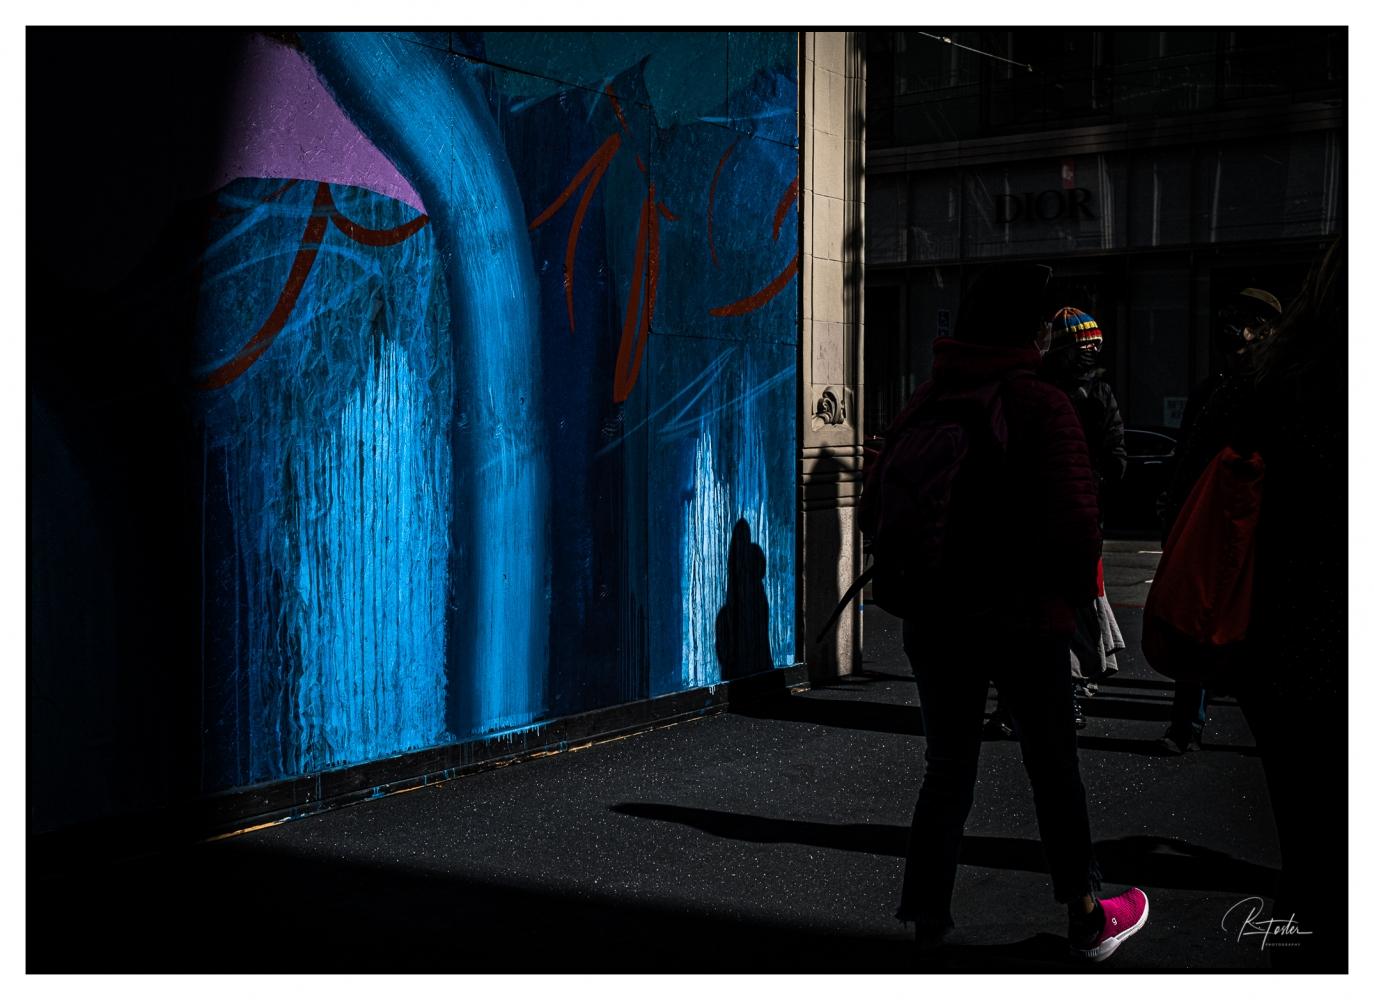 Pink Shoe in Amazing Light ©2021 Reginald Foster